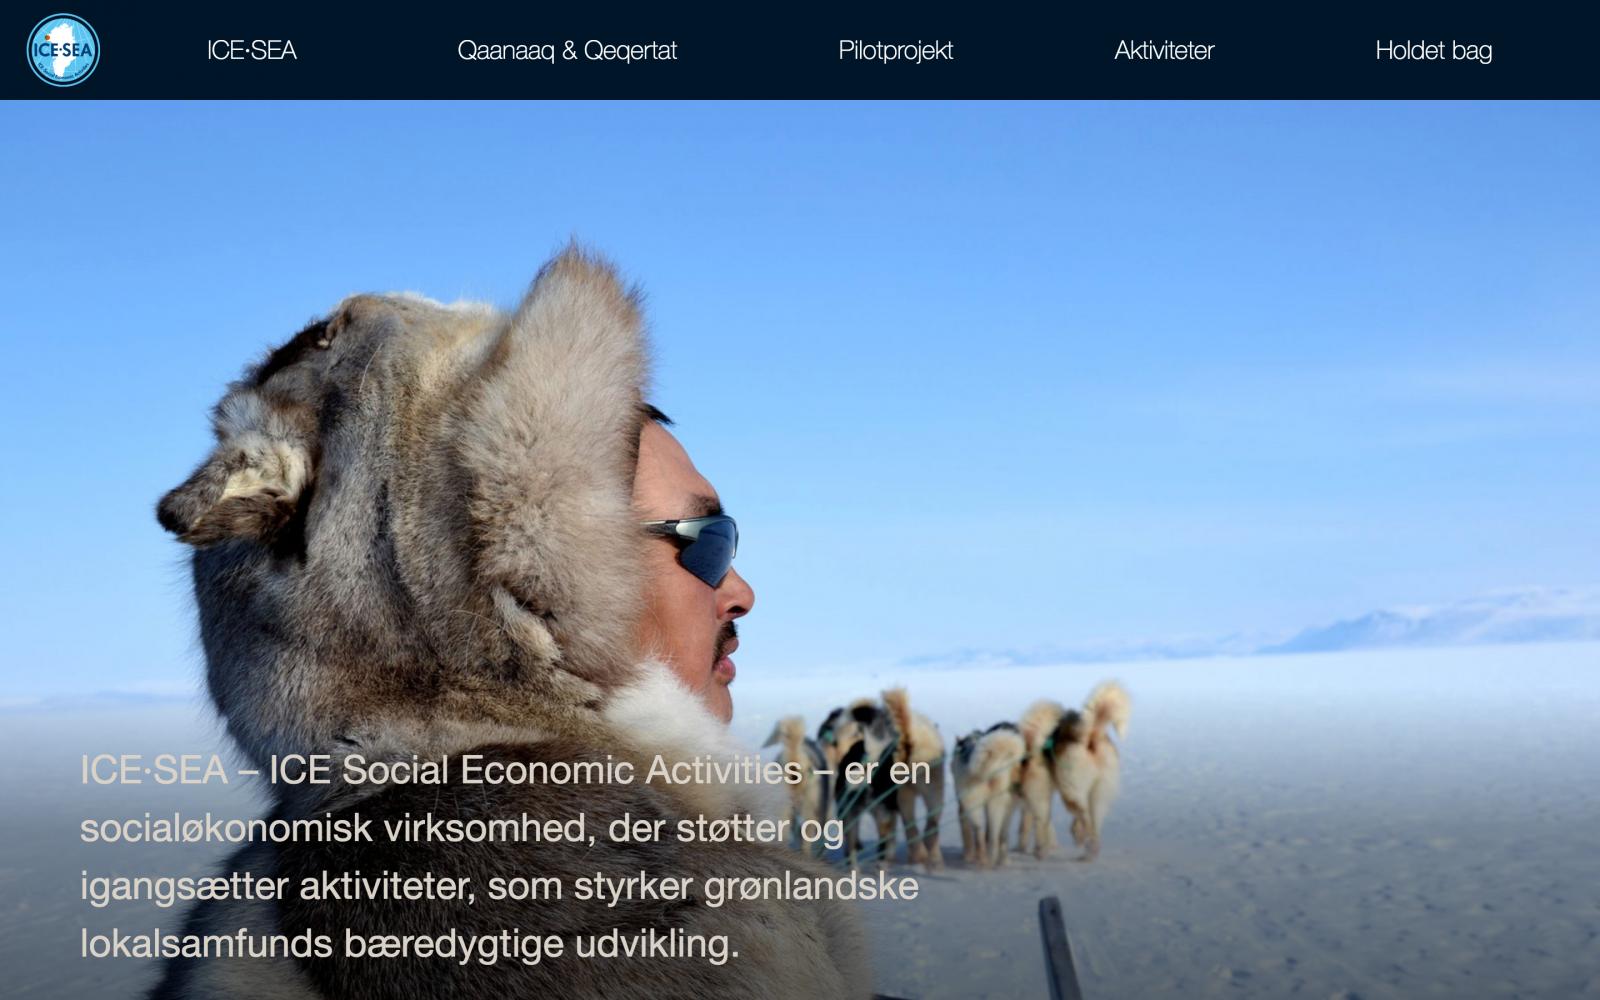 icesea.dk - desktop version.